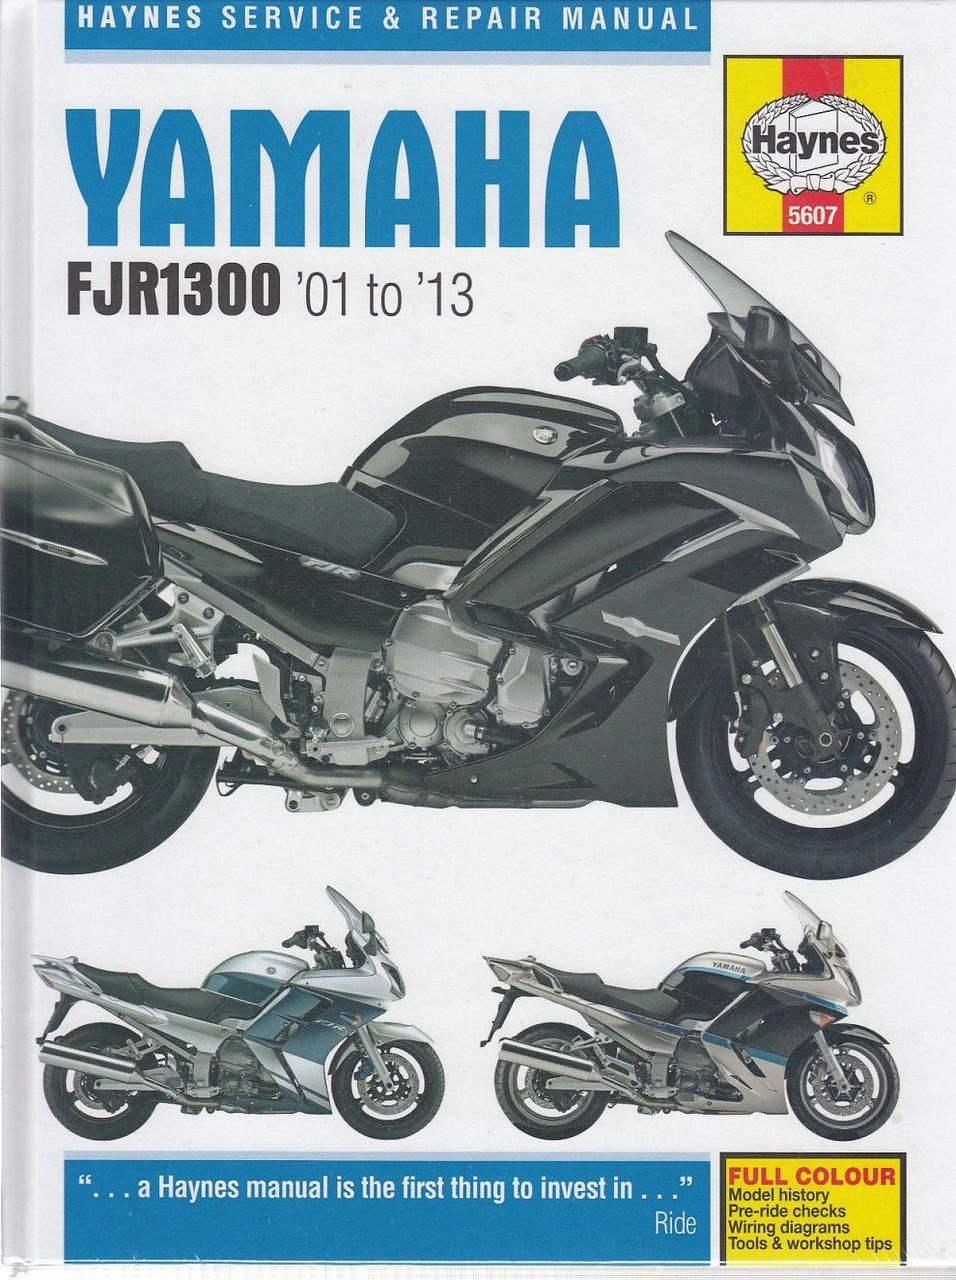 yamaha fjr1300 fjr1300a fjr1300as 1298cc 2001 2013 workshop manual rh automotobookshop com au Yamaha ATV Wiring Diagram Yamaha ATV Wiring Diagram